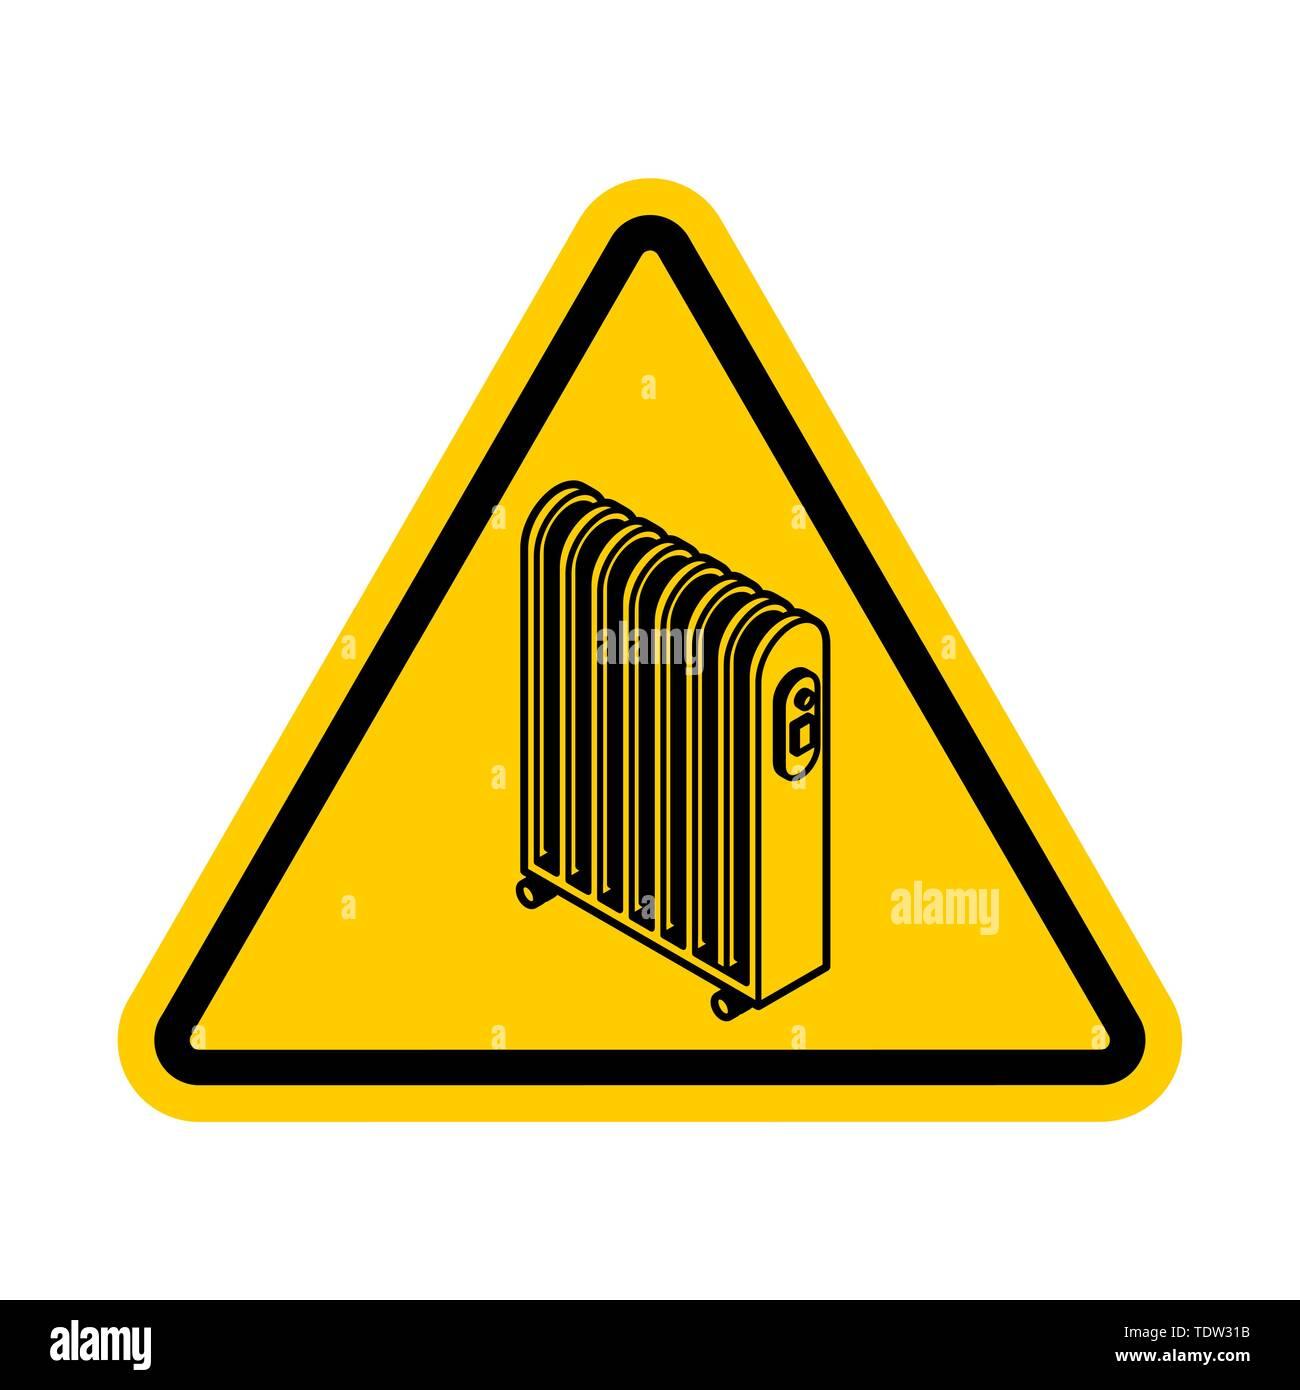 Attention Radiator heat . Warning yellow road sign. Caution Electric heating radiator - Stock Image